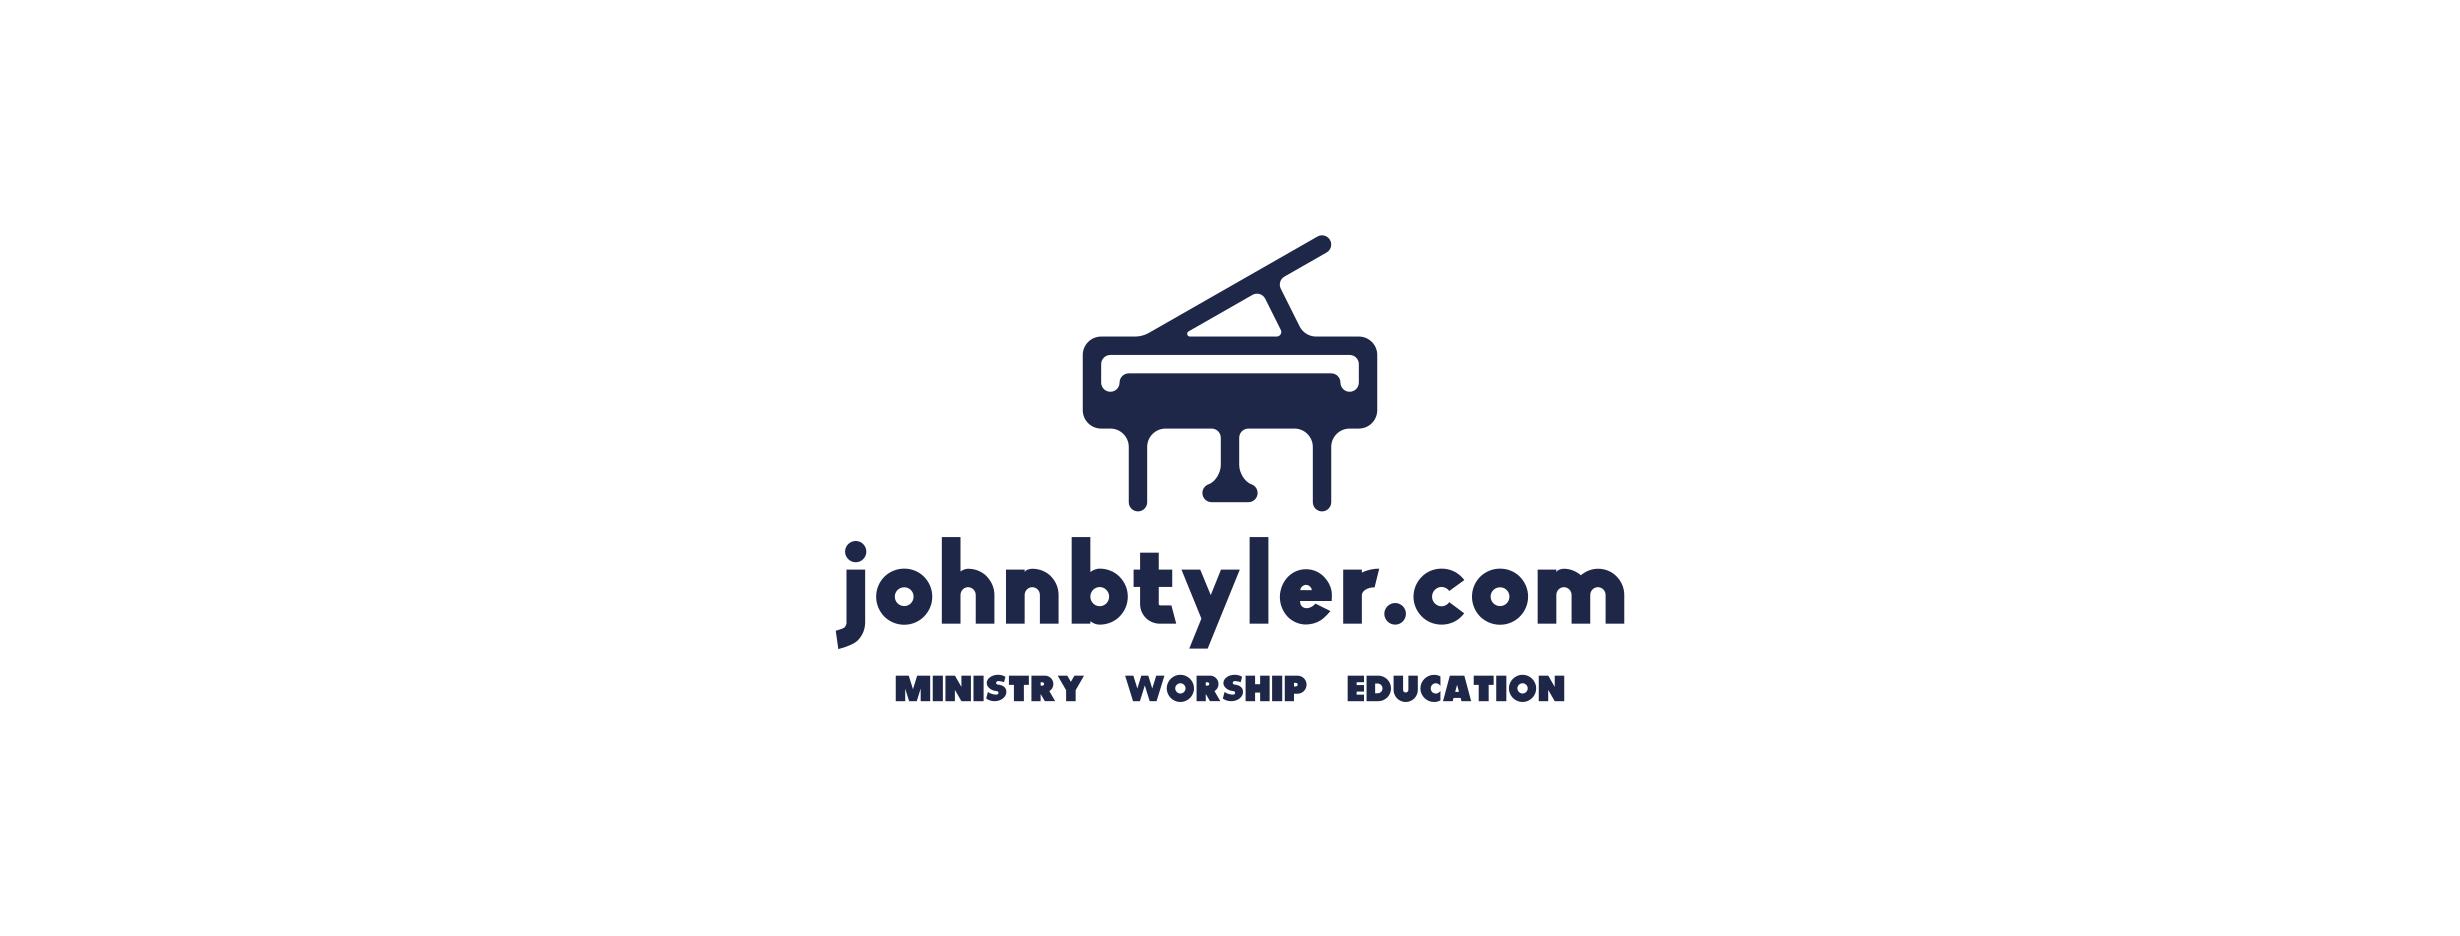 johnbtyler.com